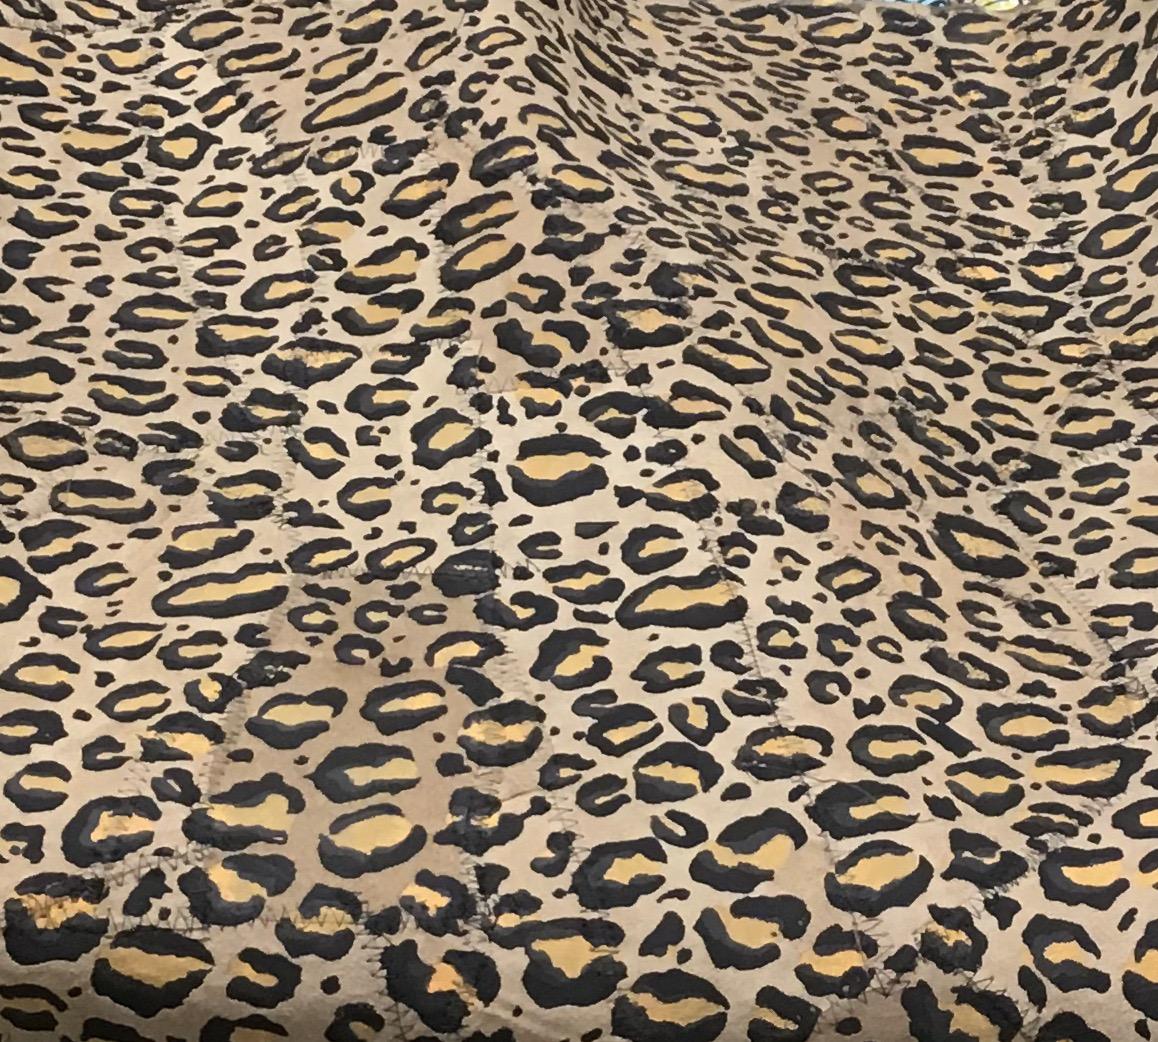 Leopard Faux Suede Fabric